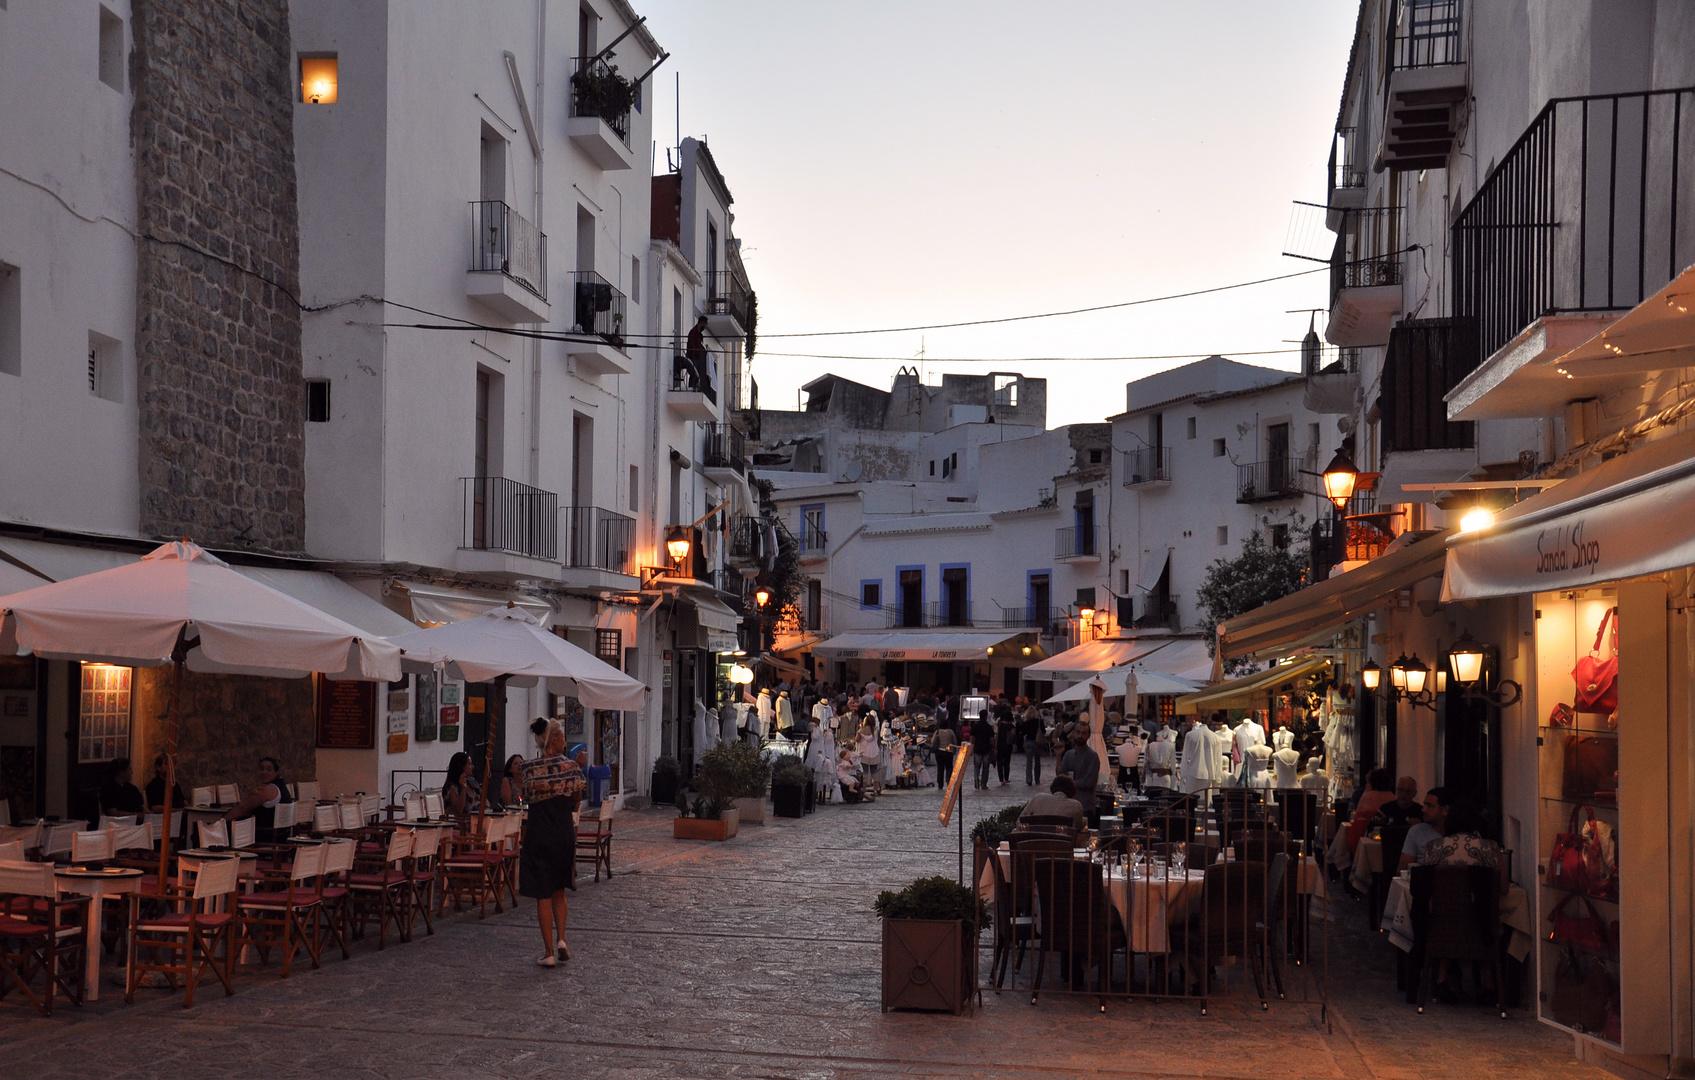 Eivissa / Ibiza : Placa de Vila